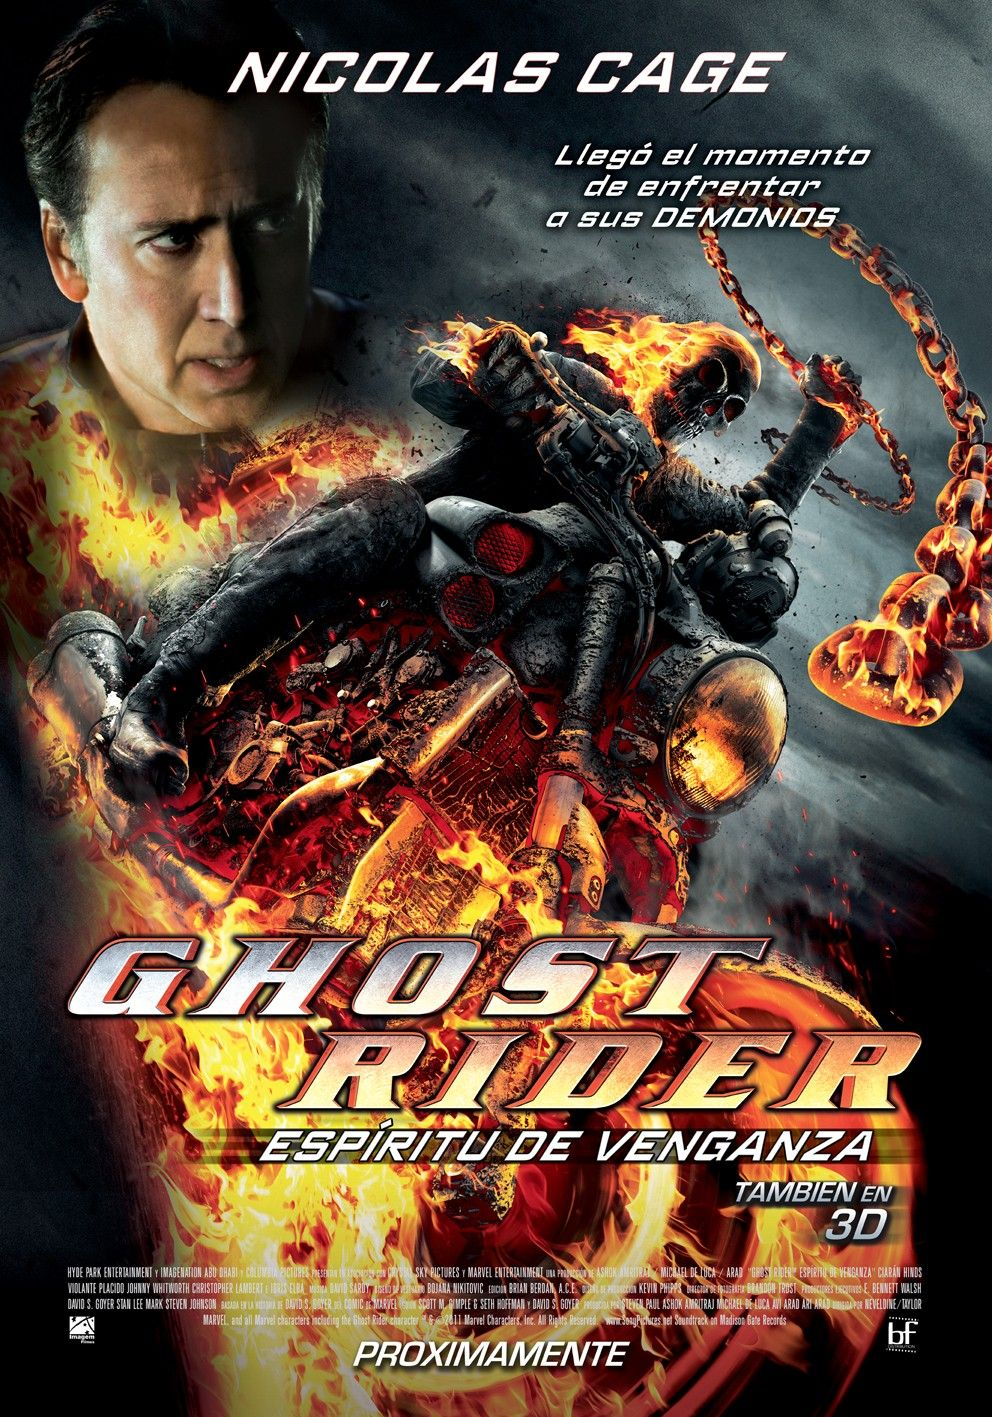 Movie Posters Inspiration 96 Ghost Rider Spirit Of Vengeance Ghost Rider Ghost Rider 2 Ghost rider spirit of vengeance game